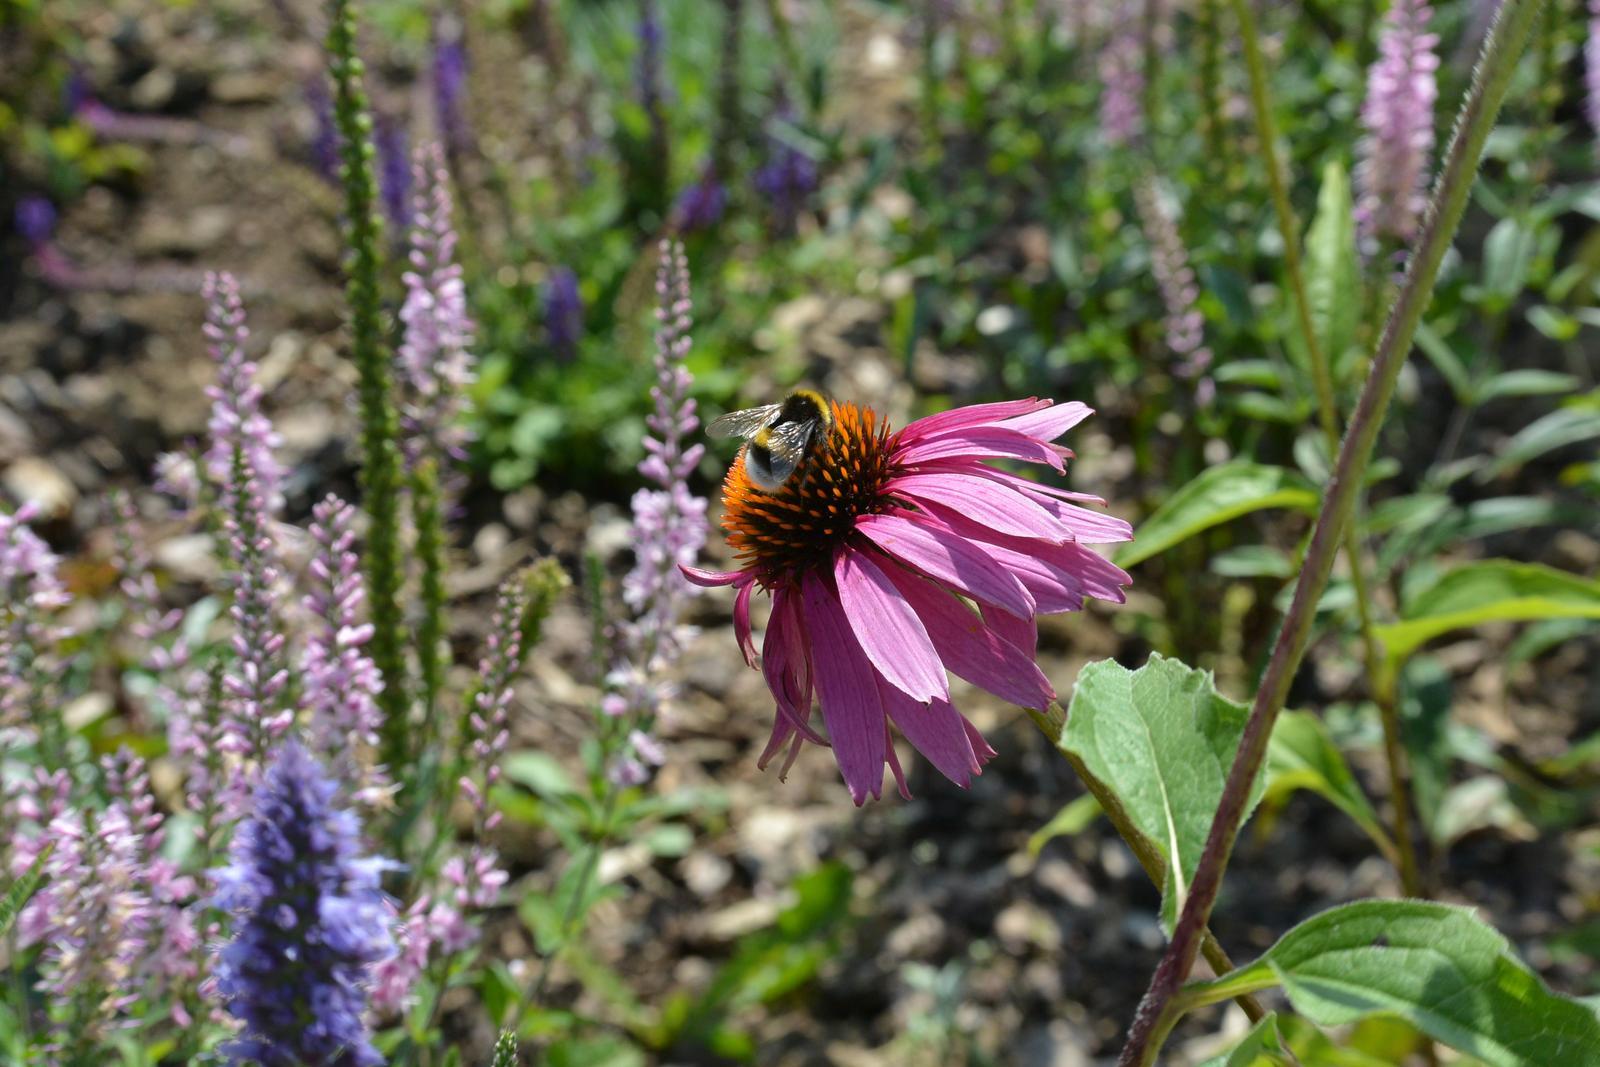 Motýlí zahrada 2019-2020 - Obrázek č. 14